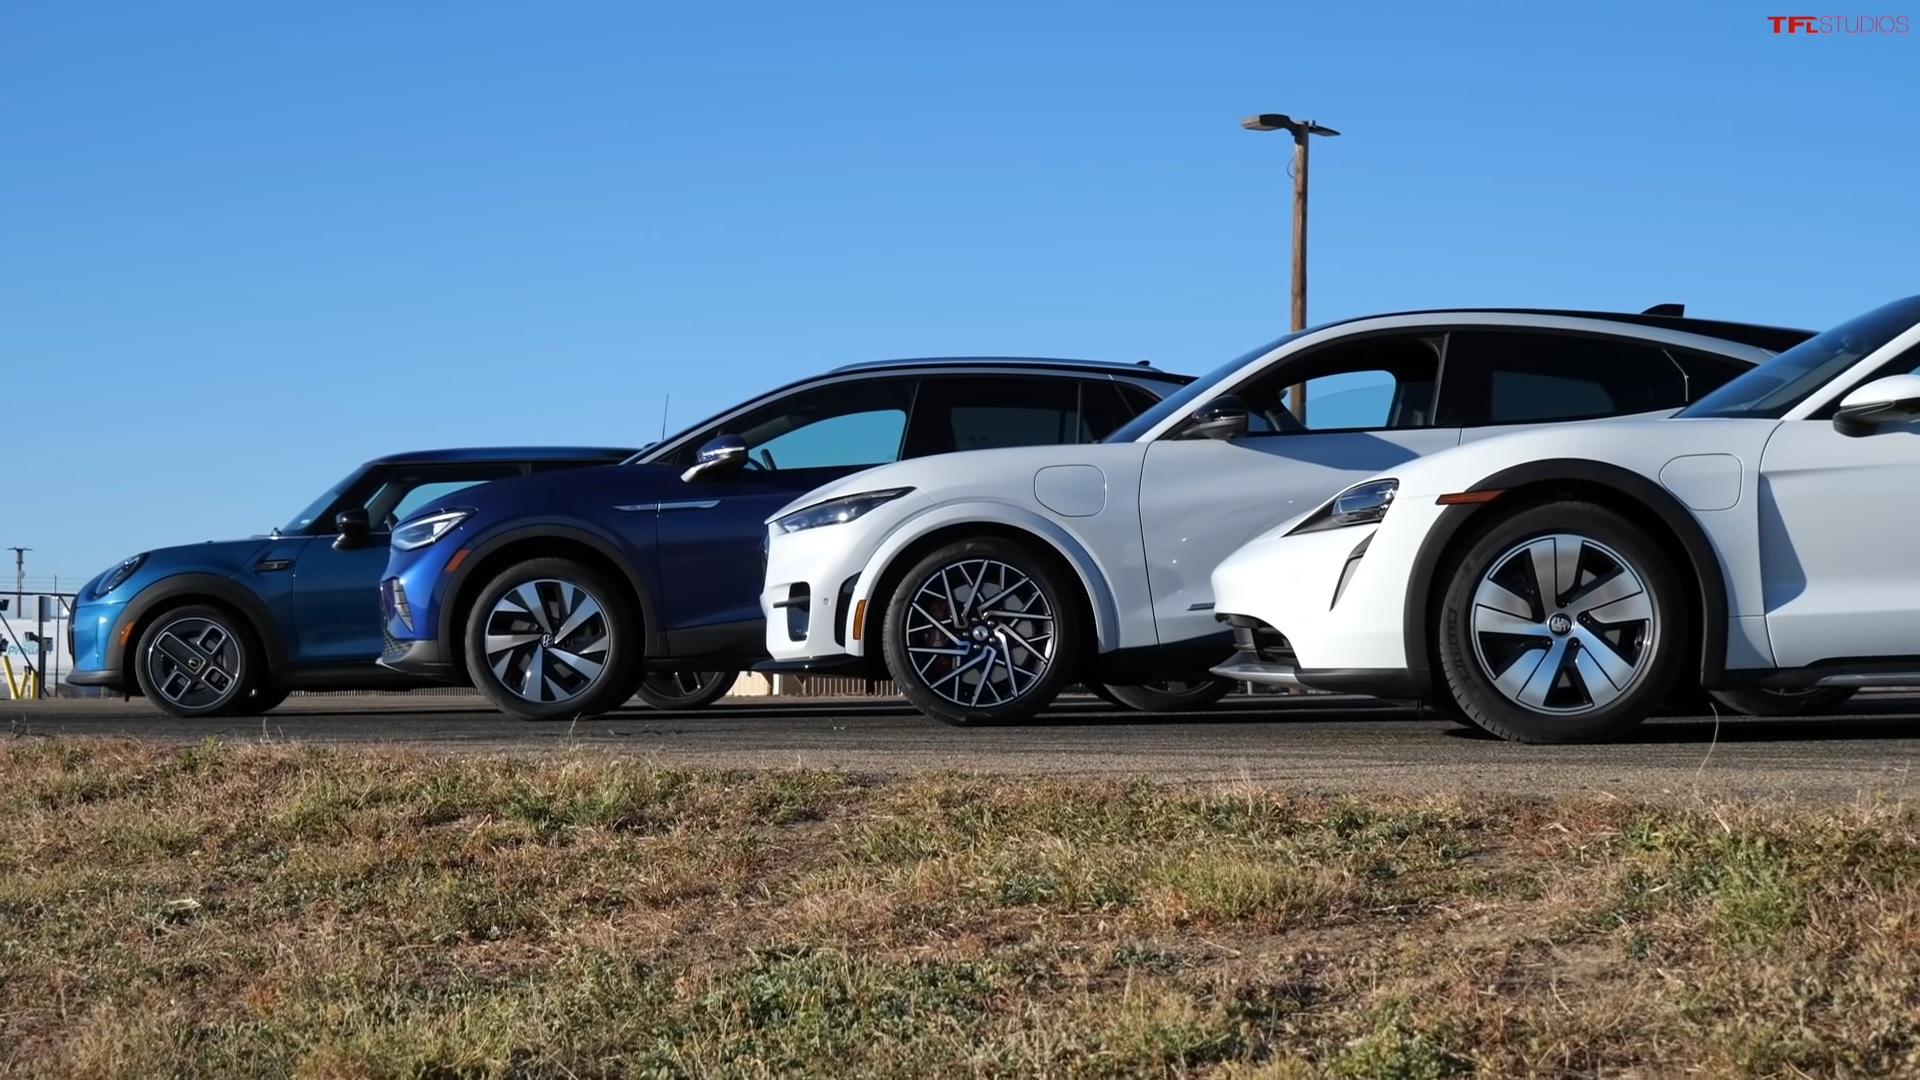 Porsche Taycan vs. Mach-E vs. ID.4 vs. Cooper SE Acceleration Test Yields Obvious Winner